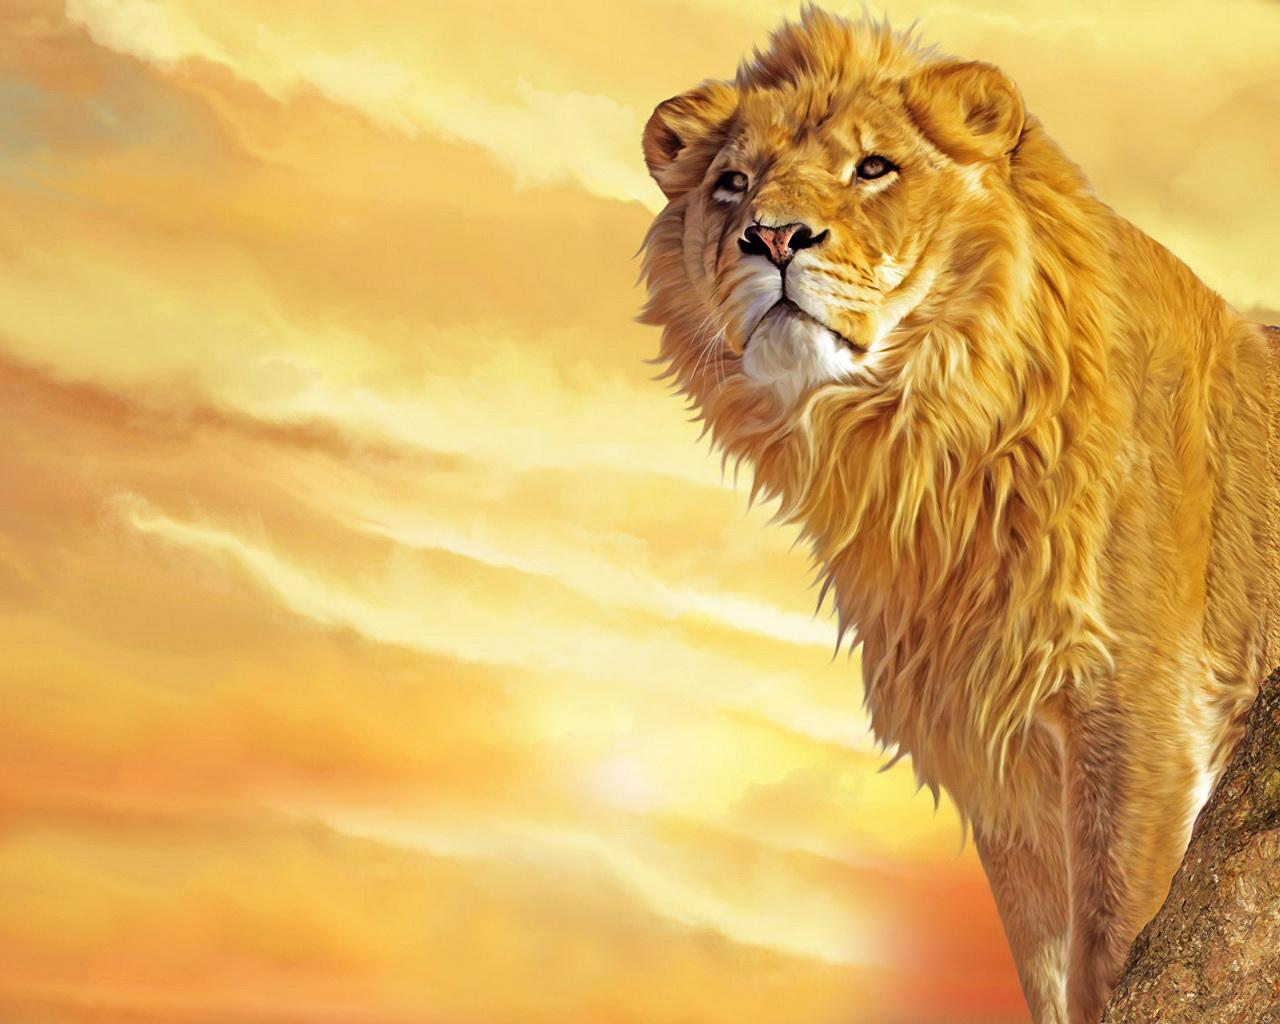 http://3.bp.blogspot.com/-MeUFZTFp7is/UMBLJMqan2I/AAAAAAAACno/9OvtLeYe5zA/s1600/Lion+animal+desktop+wallpaper.jpg